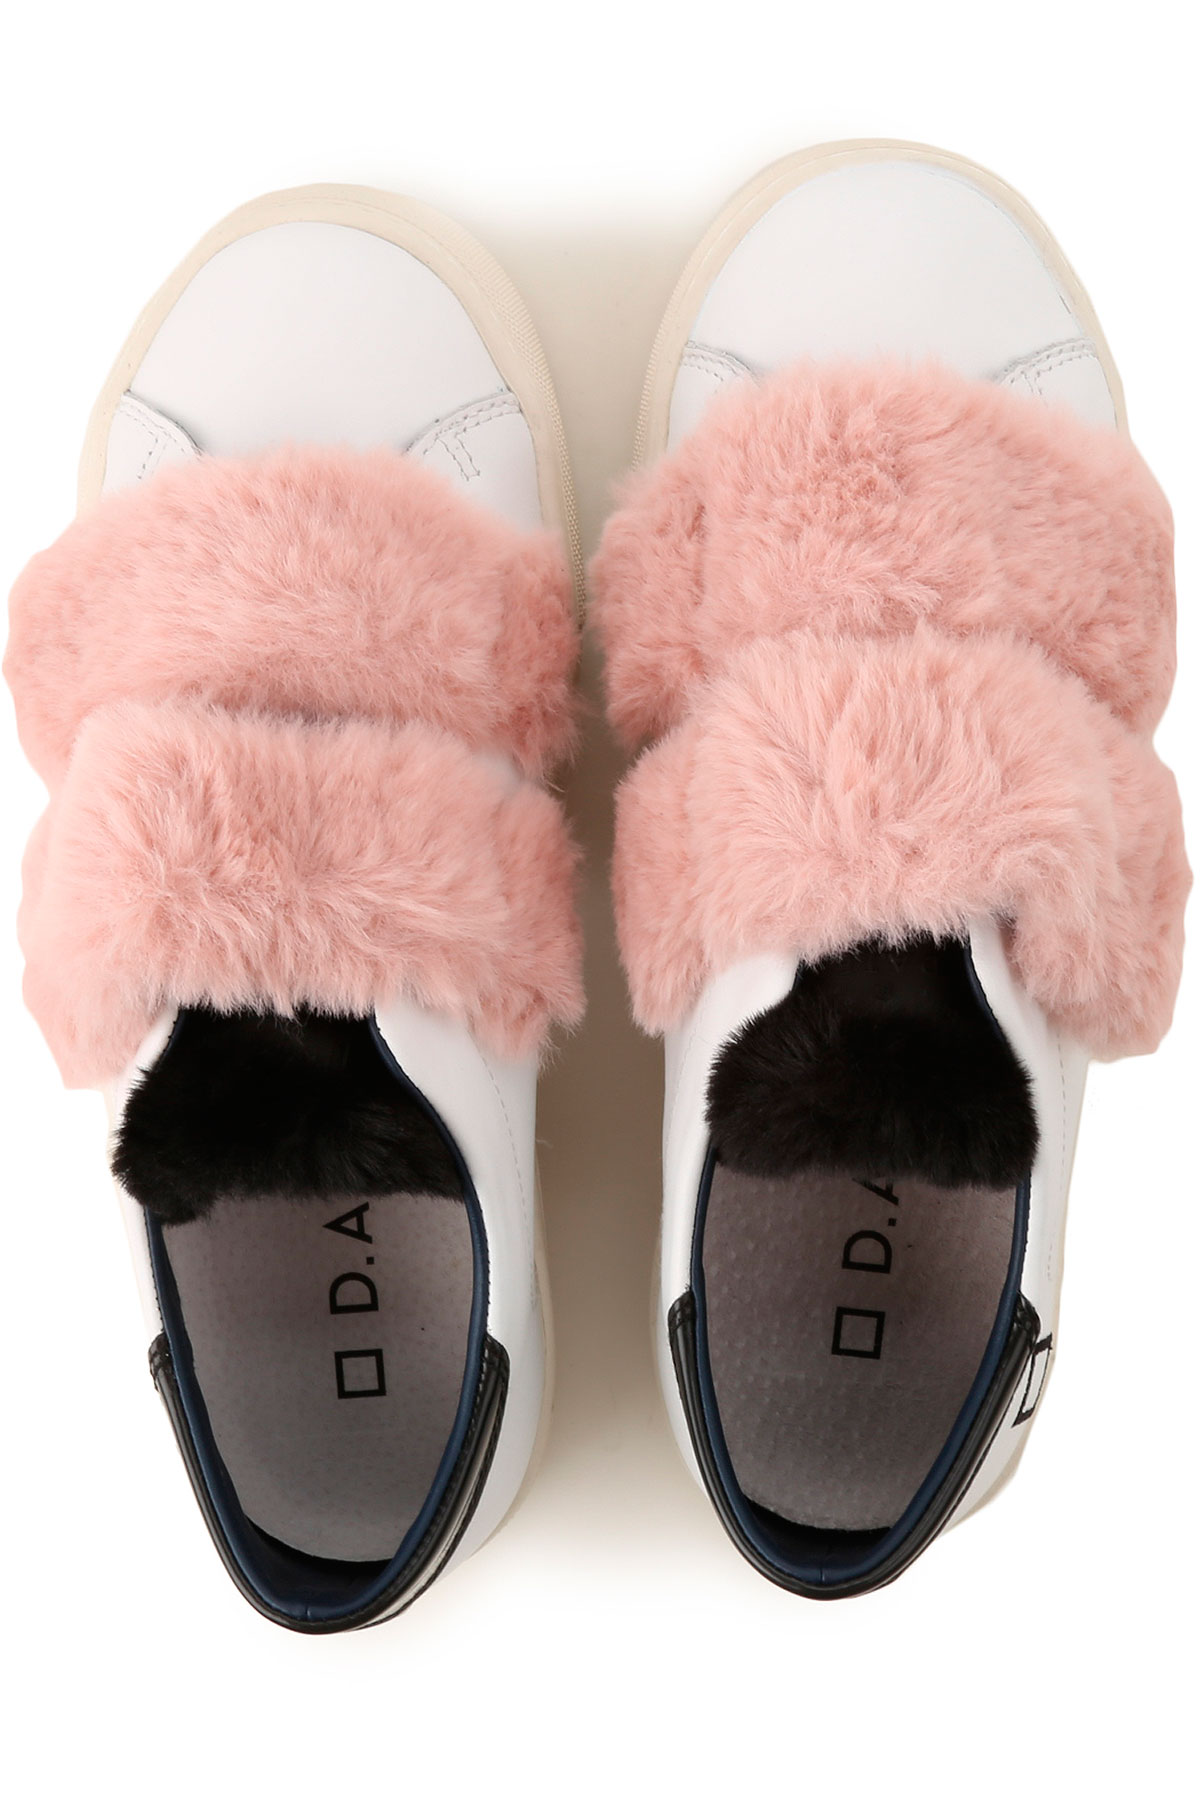 a t nbsp;rosado 2018 Otoño D Para invierno Mujer 19 Negro Zapatos e Blanco d7F5q